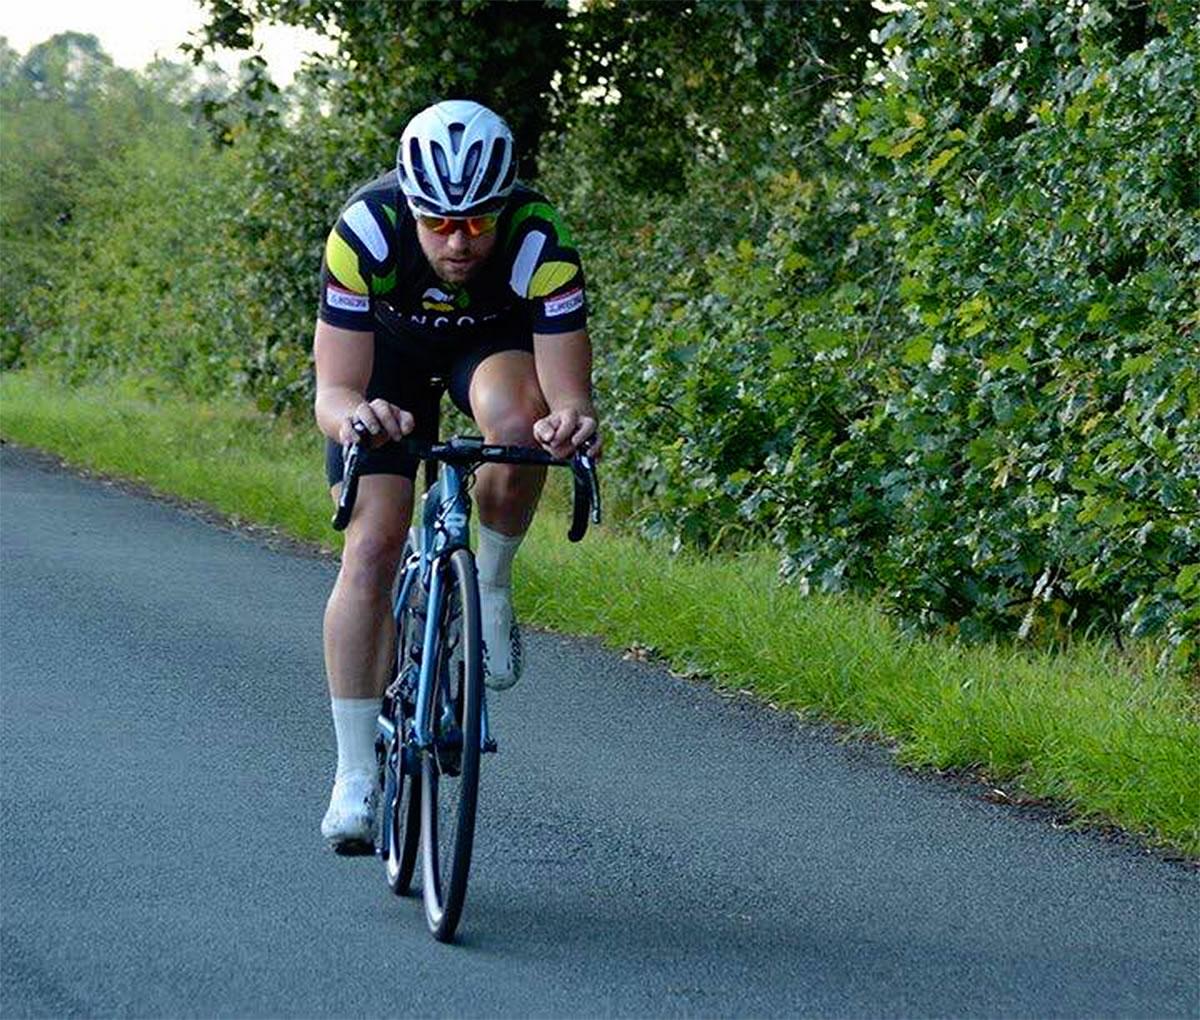 jonny okell time trial rider runcorn cycle club